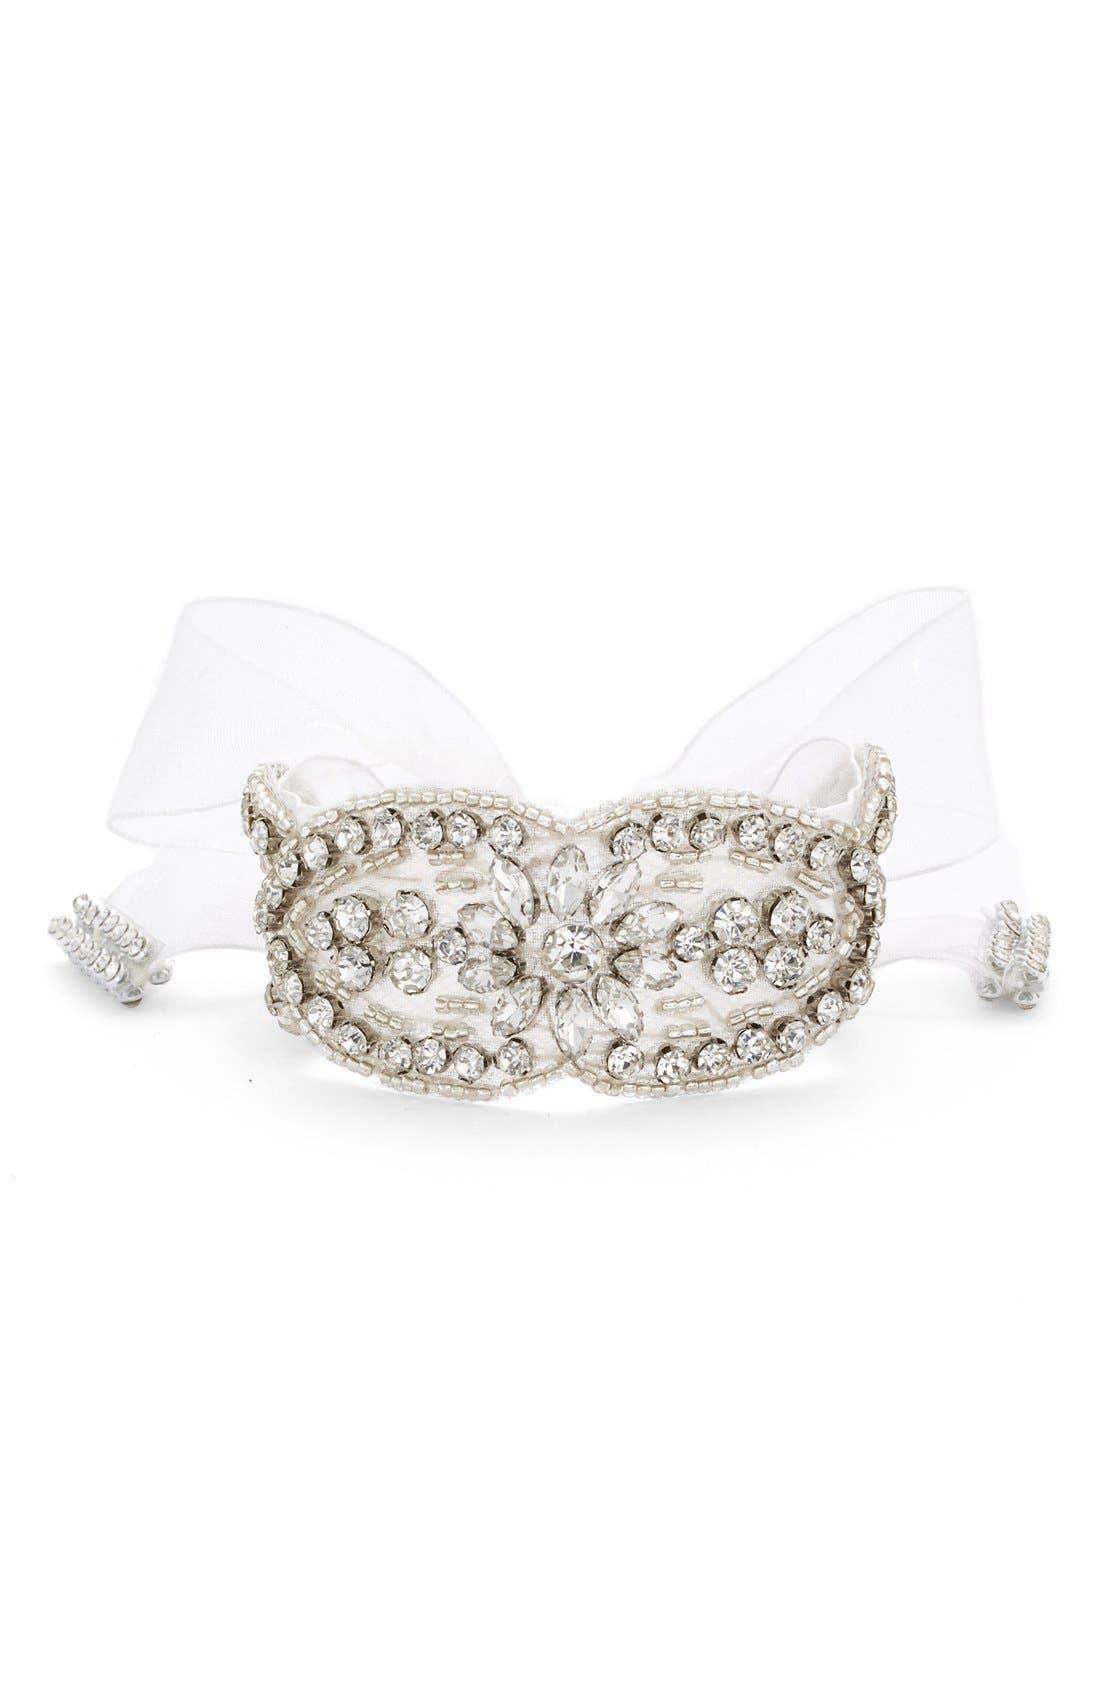 NINA 'Pretty Boho' Jewel Tie Bracelet, Main, color, 901